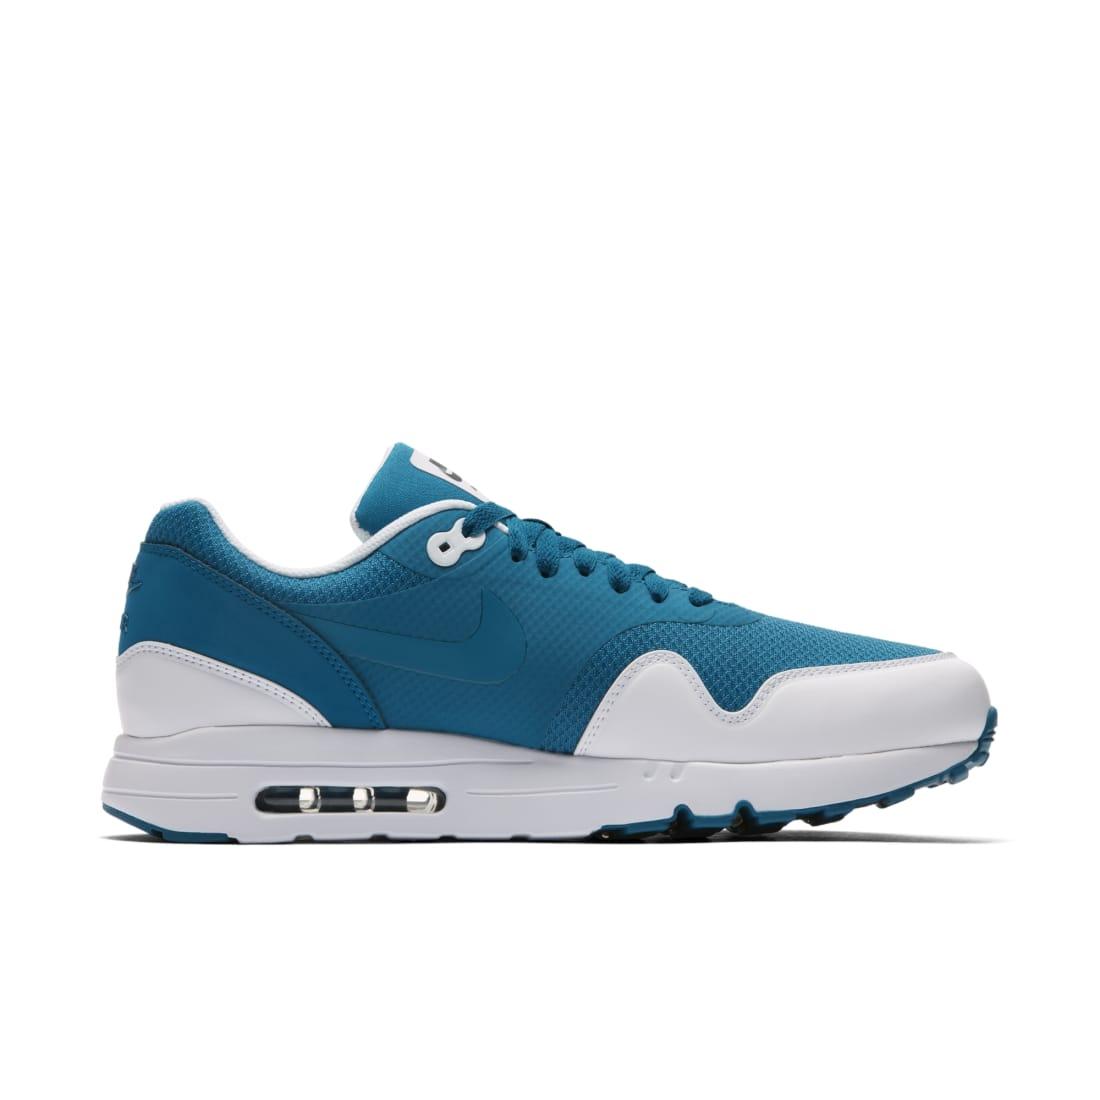 Nike Air Max 1 Ultra 2 Essential Industrial Blue